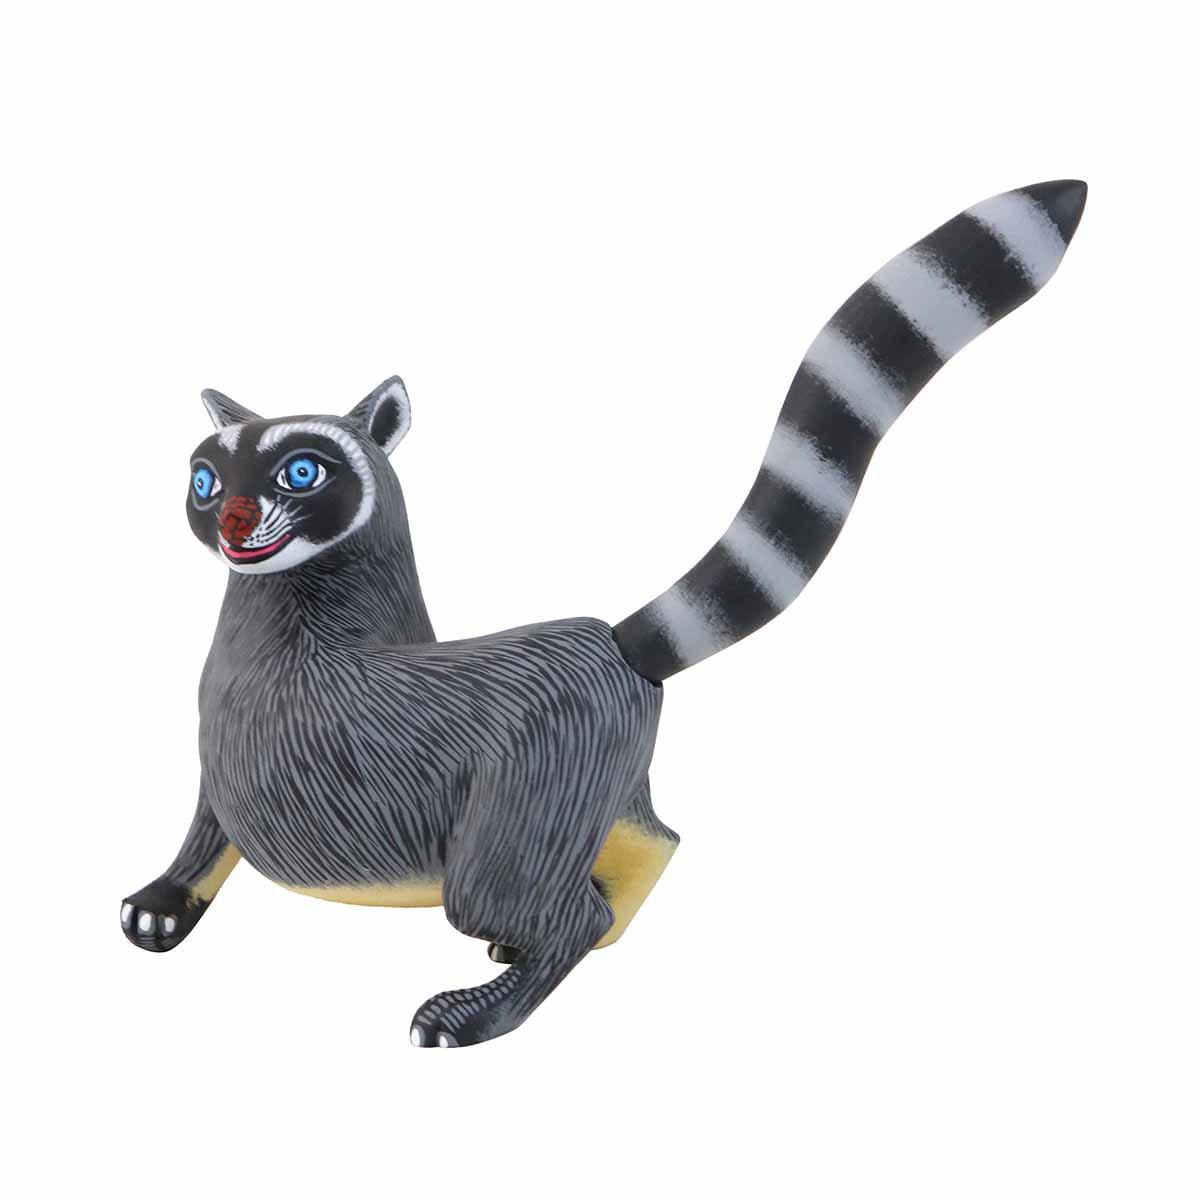 Eleazar Morales Eleazar Morales: Raccoon Raccoon